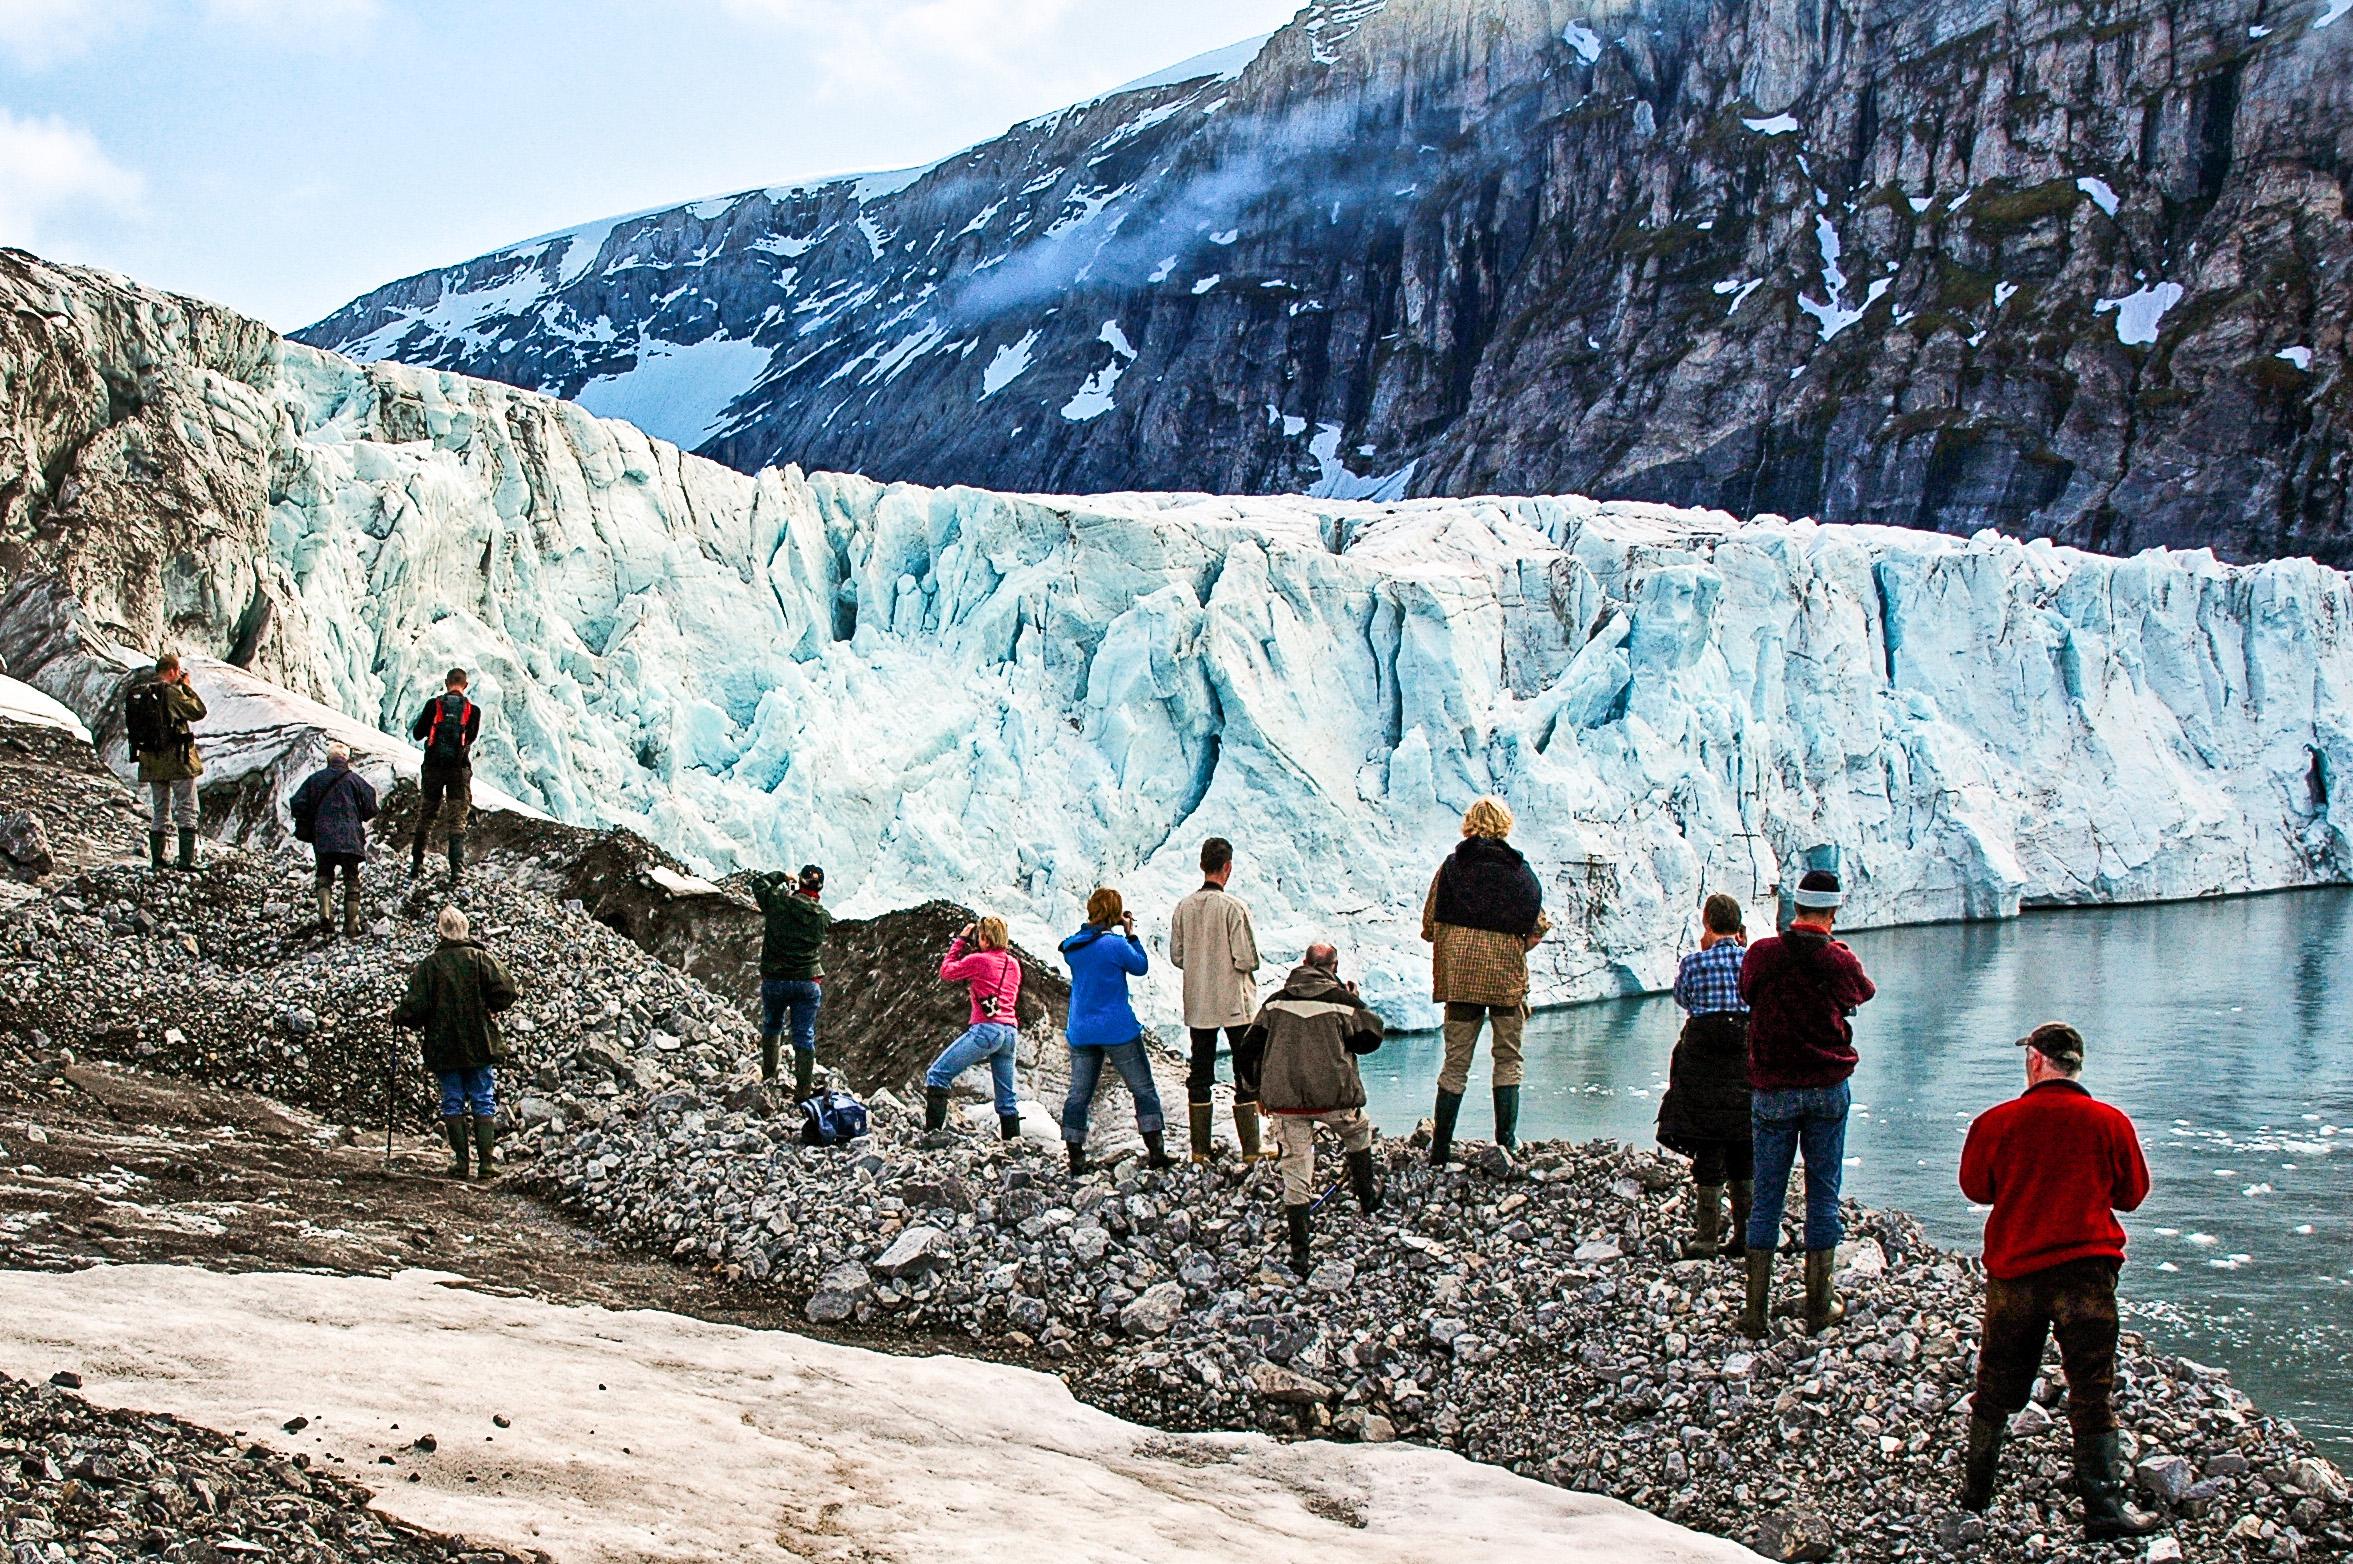 Norway, Svalbard, tourist, albatros group, people, glacier